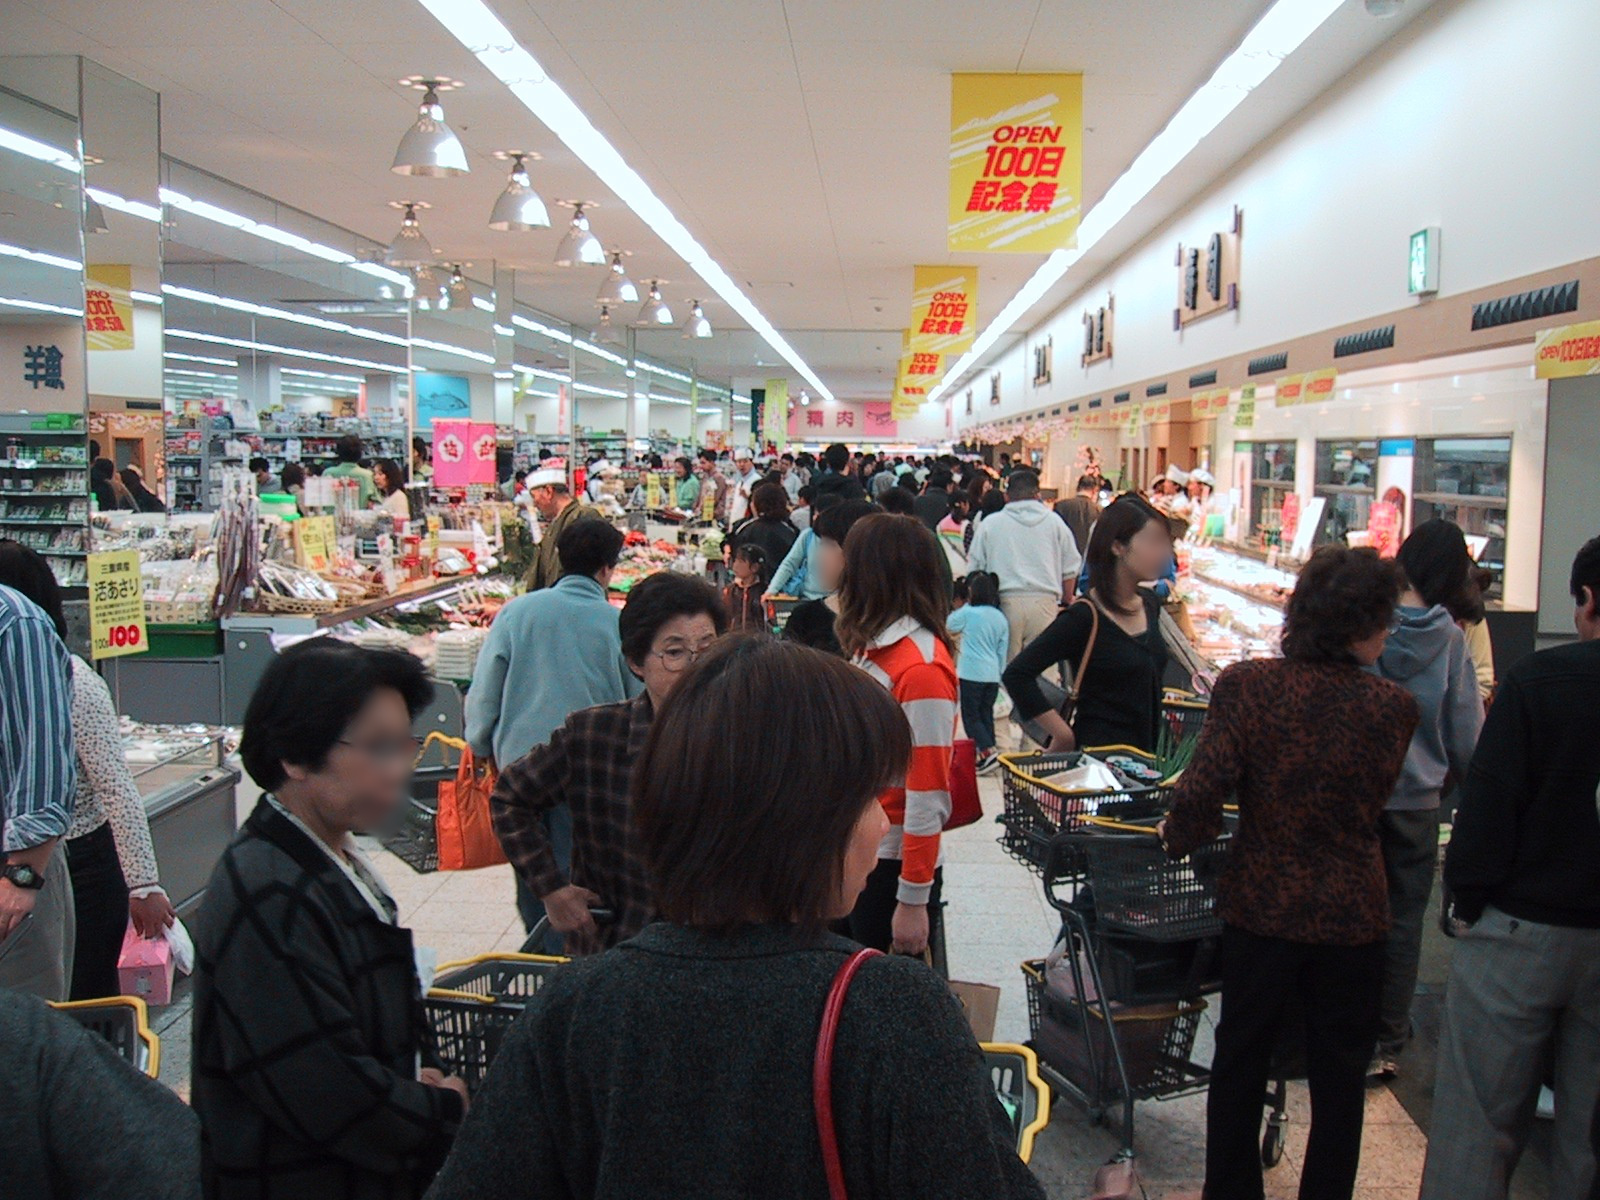 Crowded Supermarket In Nagoya Allaboutlean Com